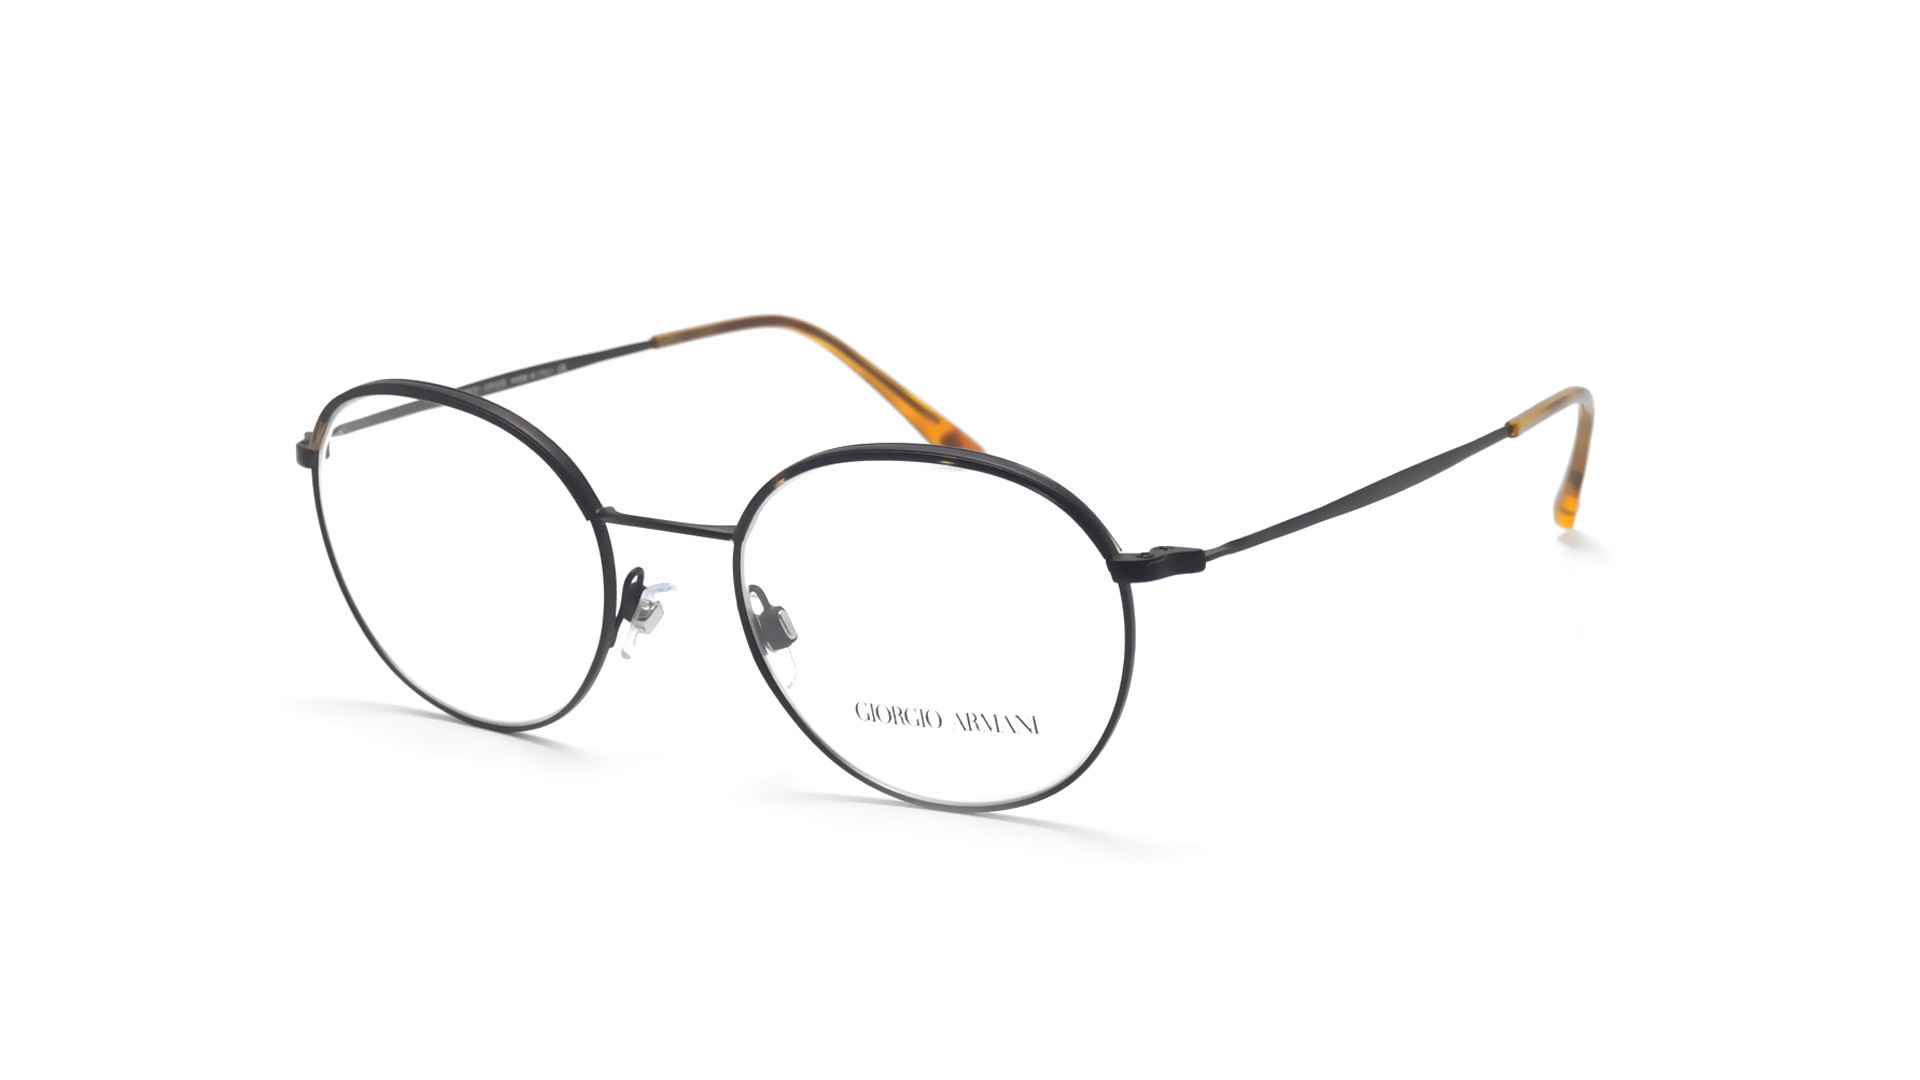 Armani Ar5070j Frames Noir Of 19 Small 3001 Giorgio Mat 49 Life q35j4RLA